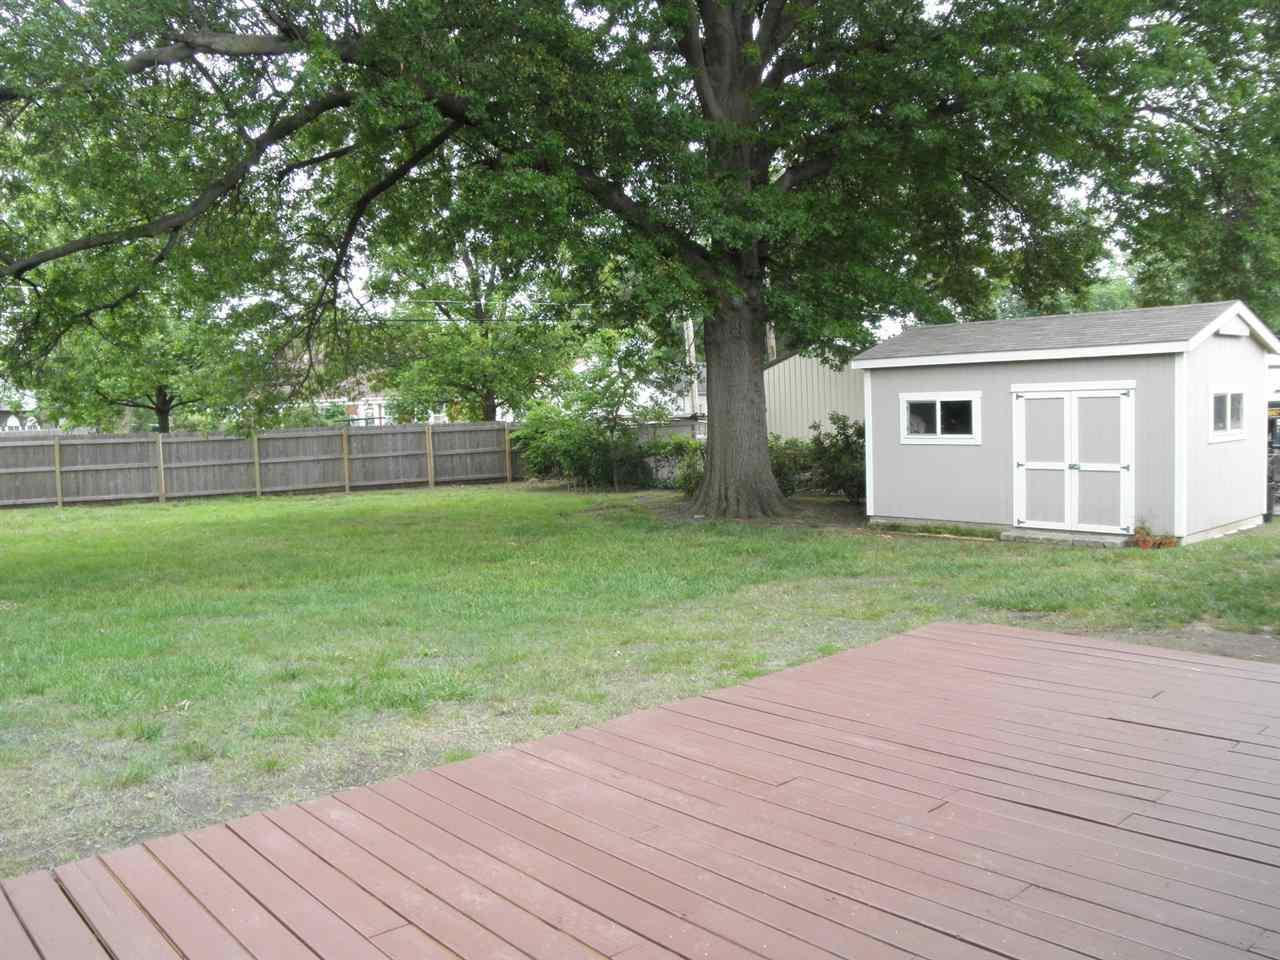 Sold Cross Sale W/ MLS | 127 Fairview  Ponca City, OK 74601 34